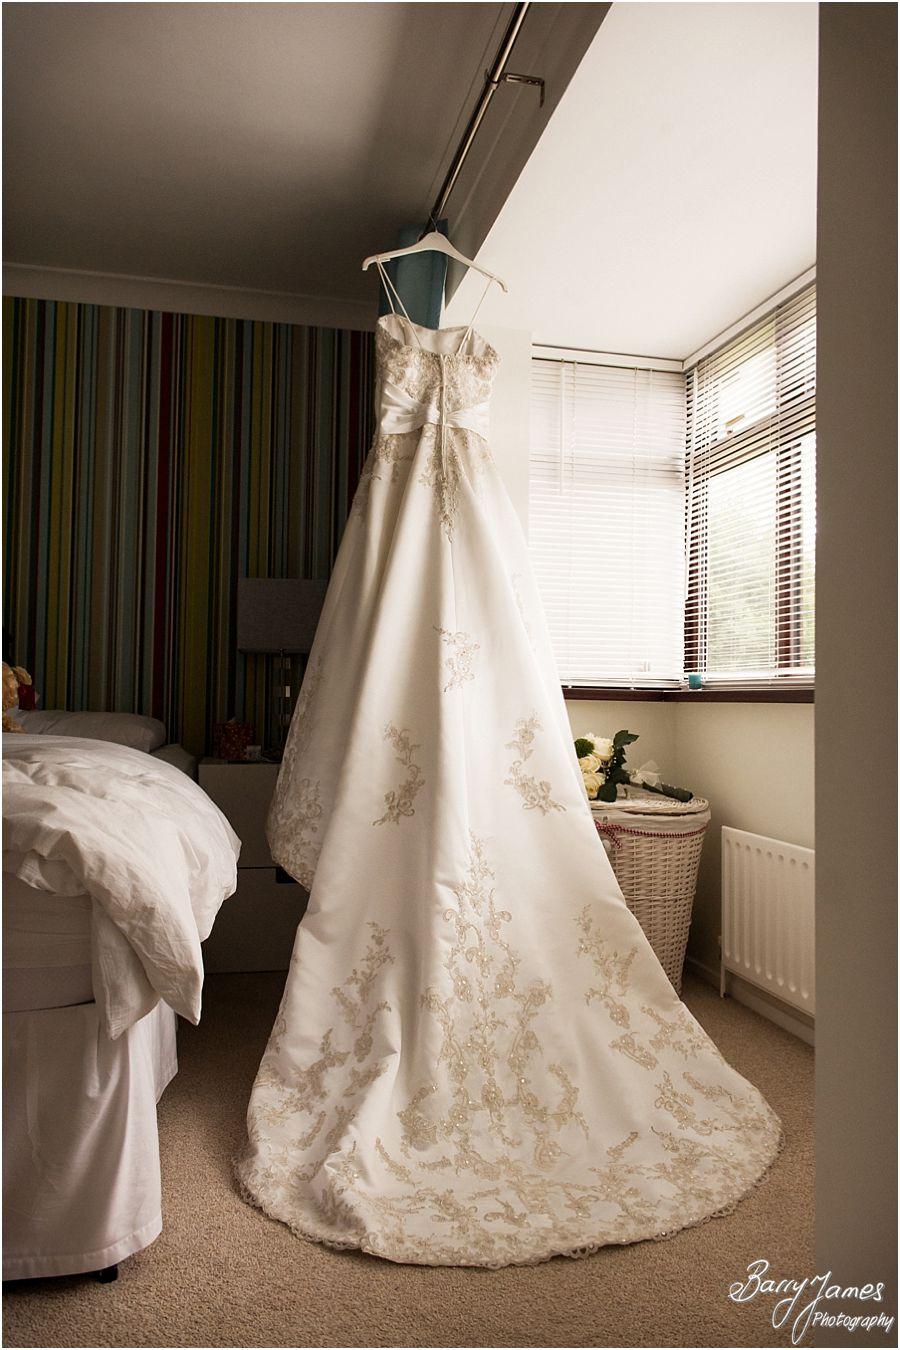 Storytelling wedding photography at Rodbaston Hall in Penkridge by Penkridge Wedding Photographer Barry James